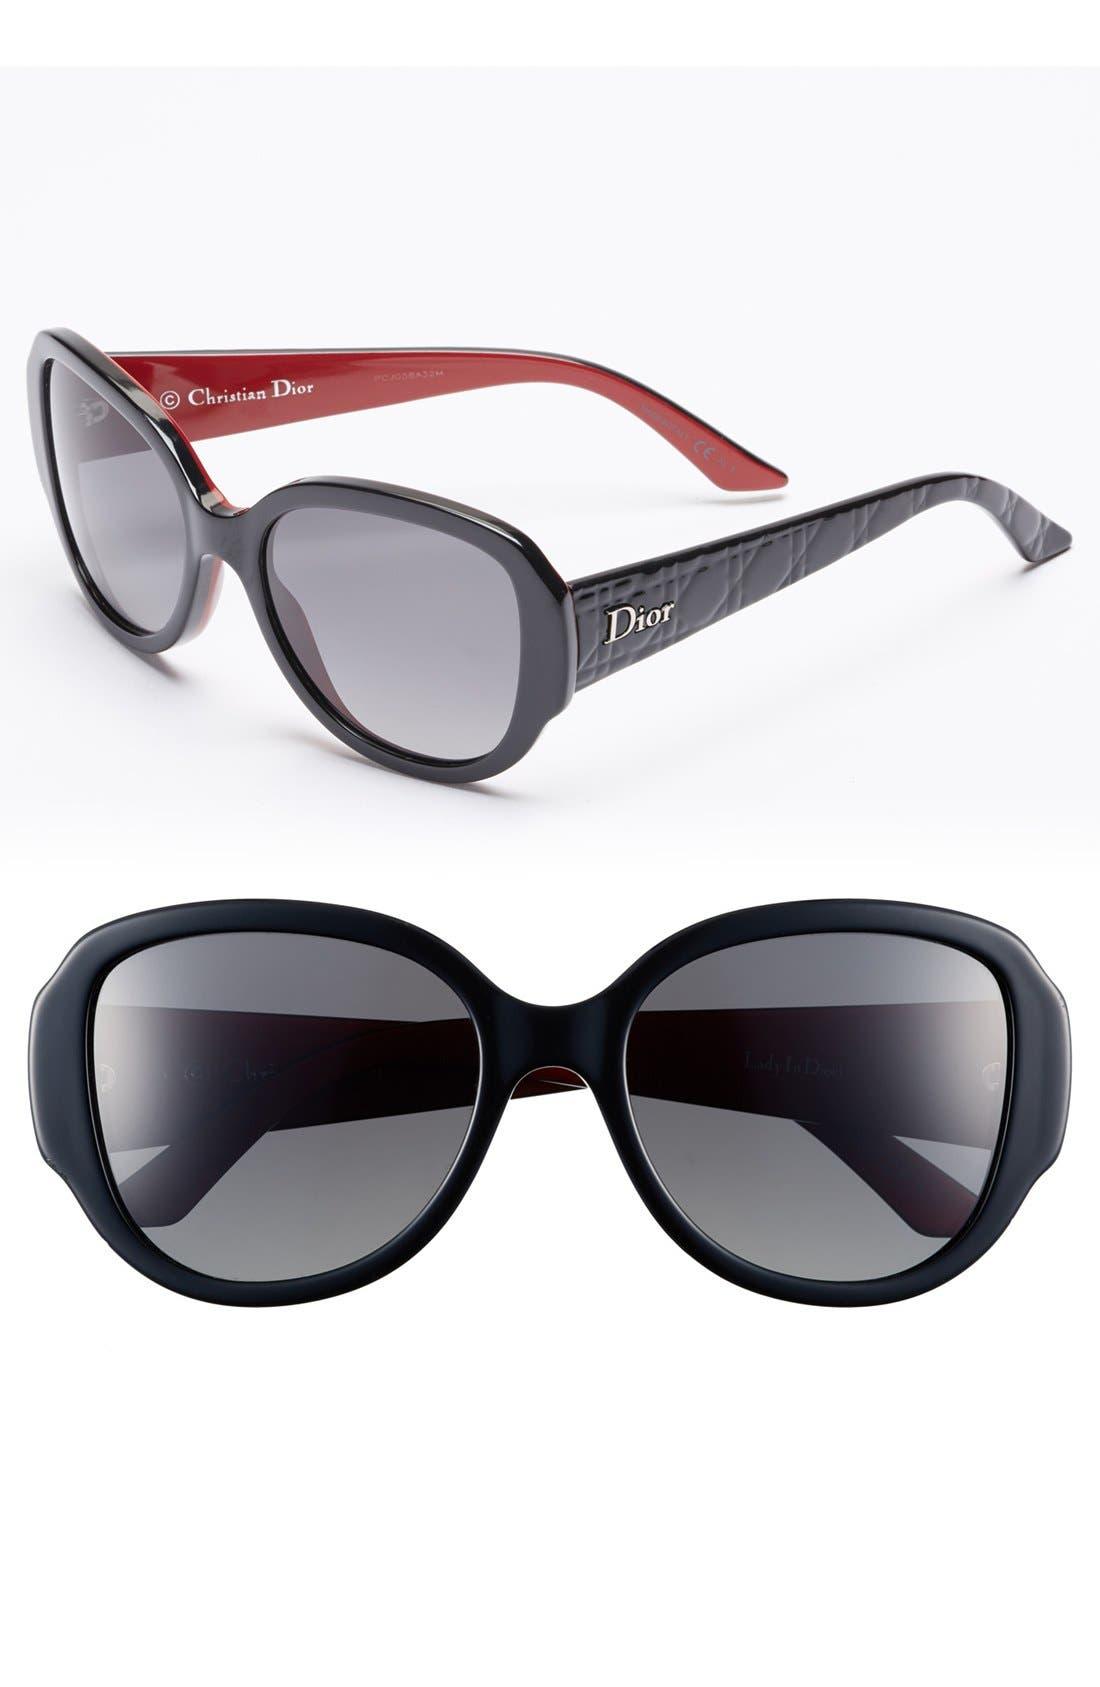 Main Image - Dior 'Lady in Dior' 55mm Polarized Sunglasses